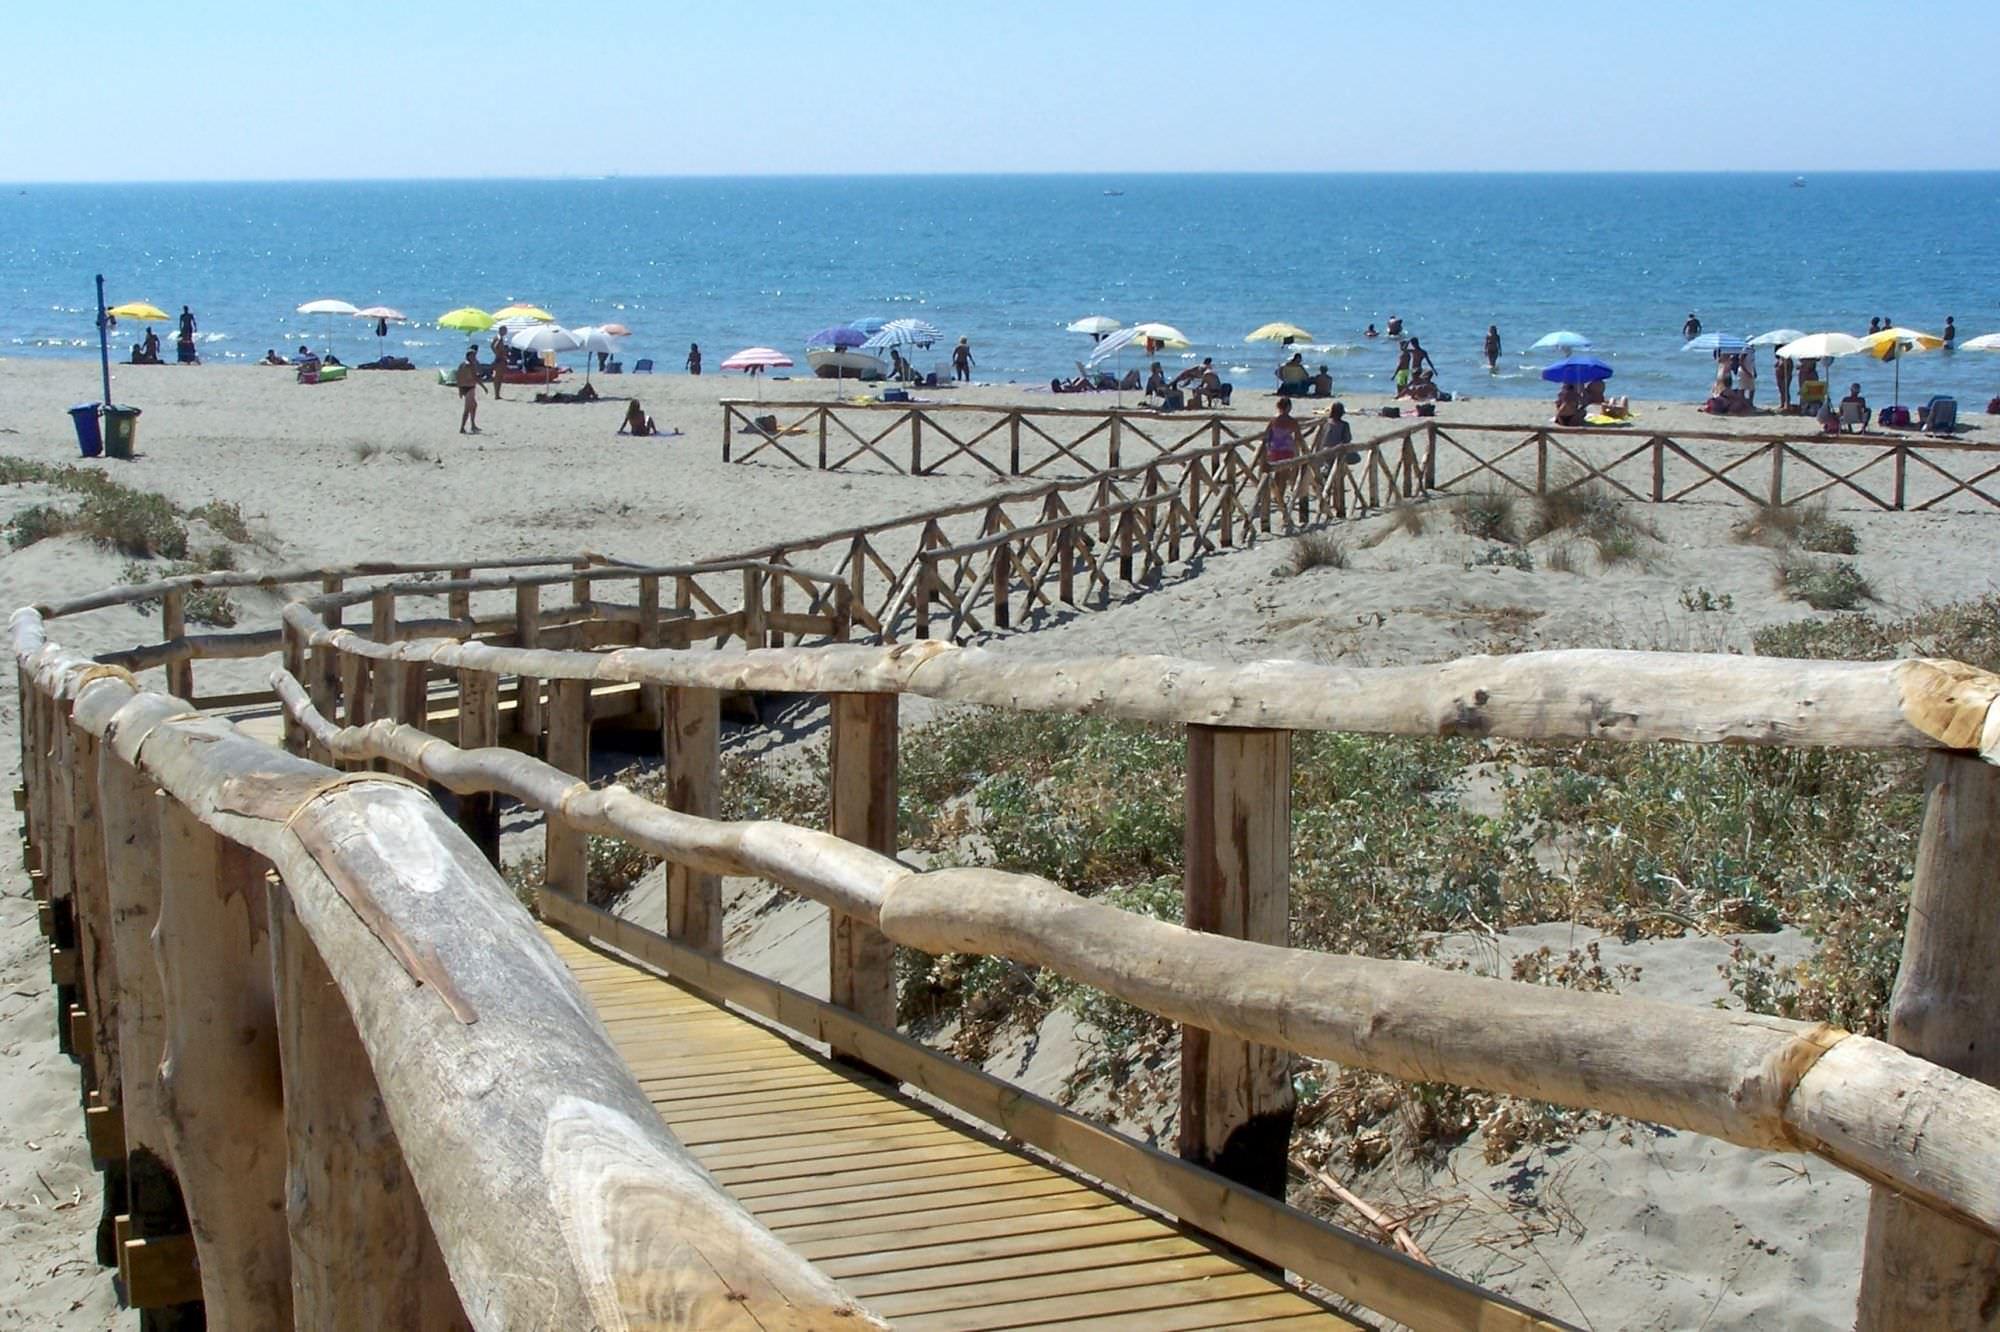 Marina di Torre del Lago Puccini beach